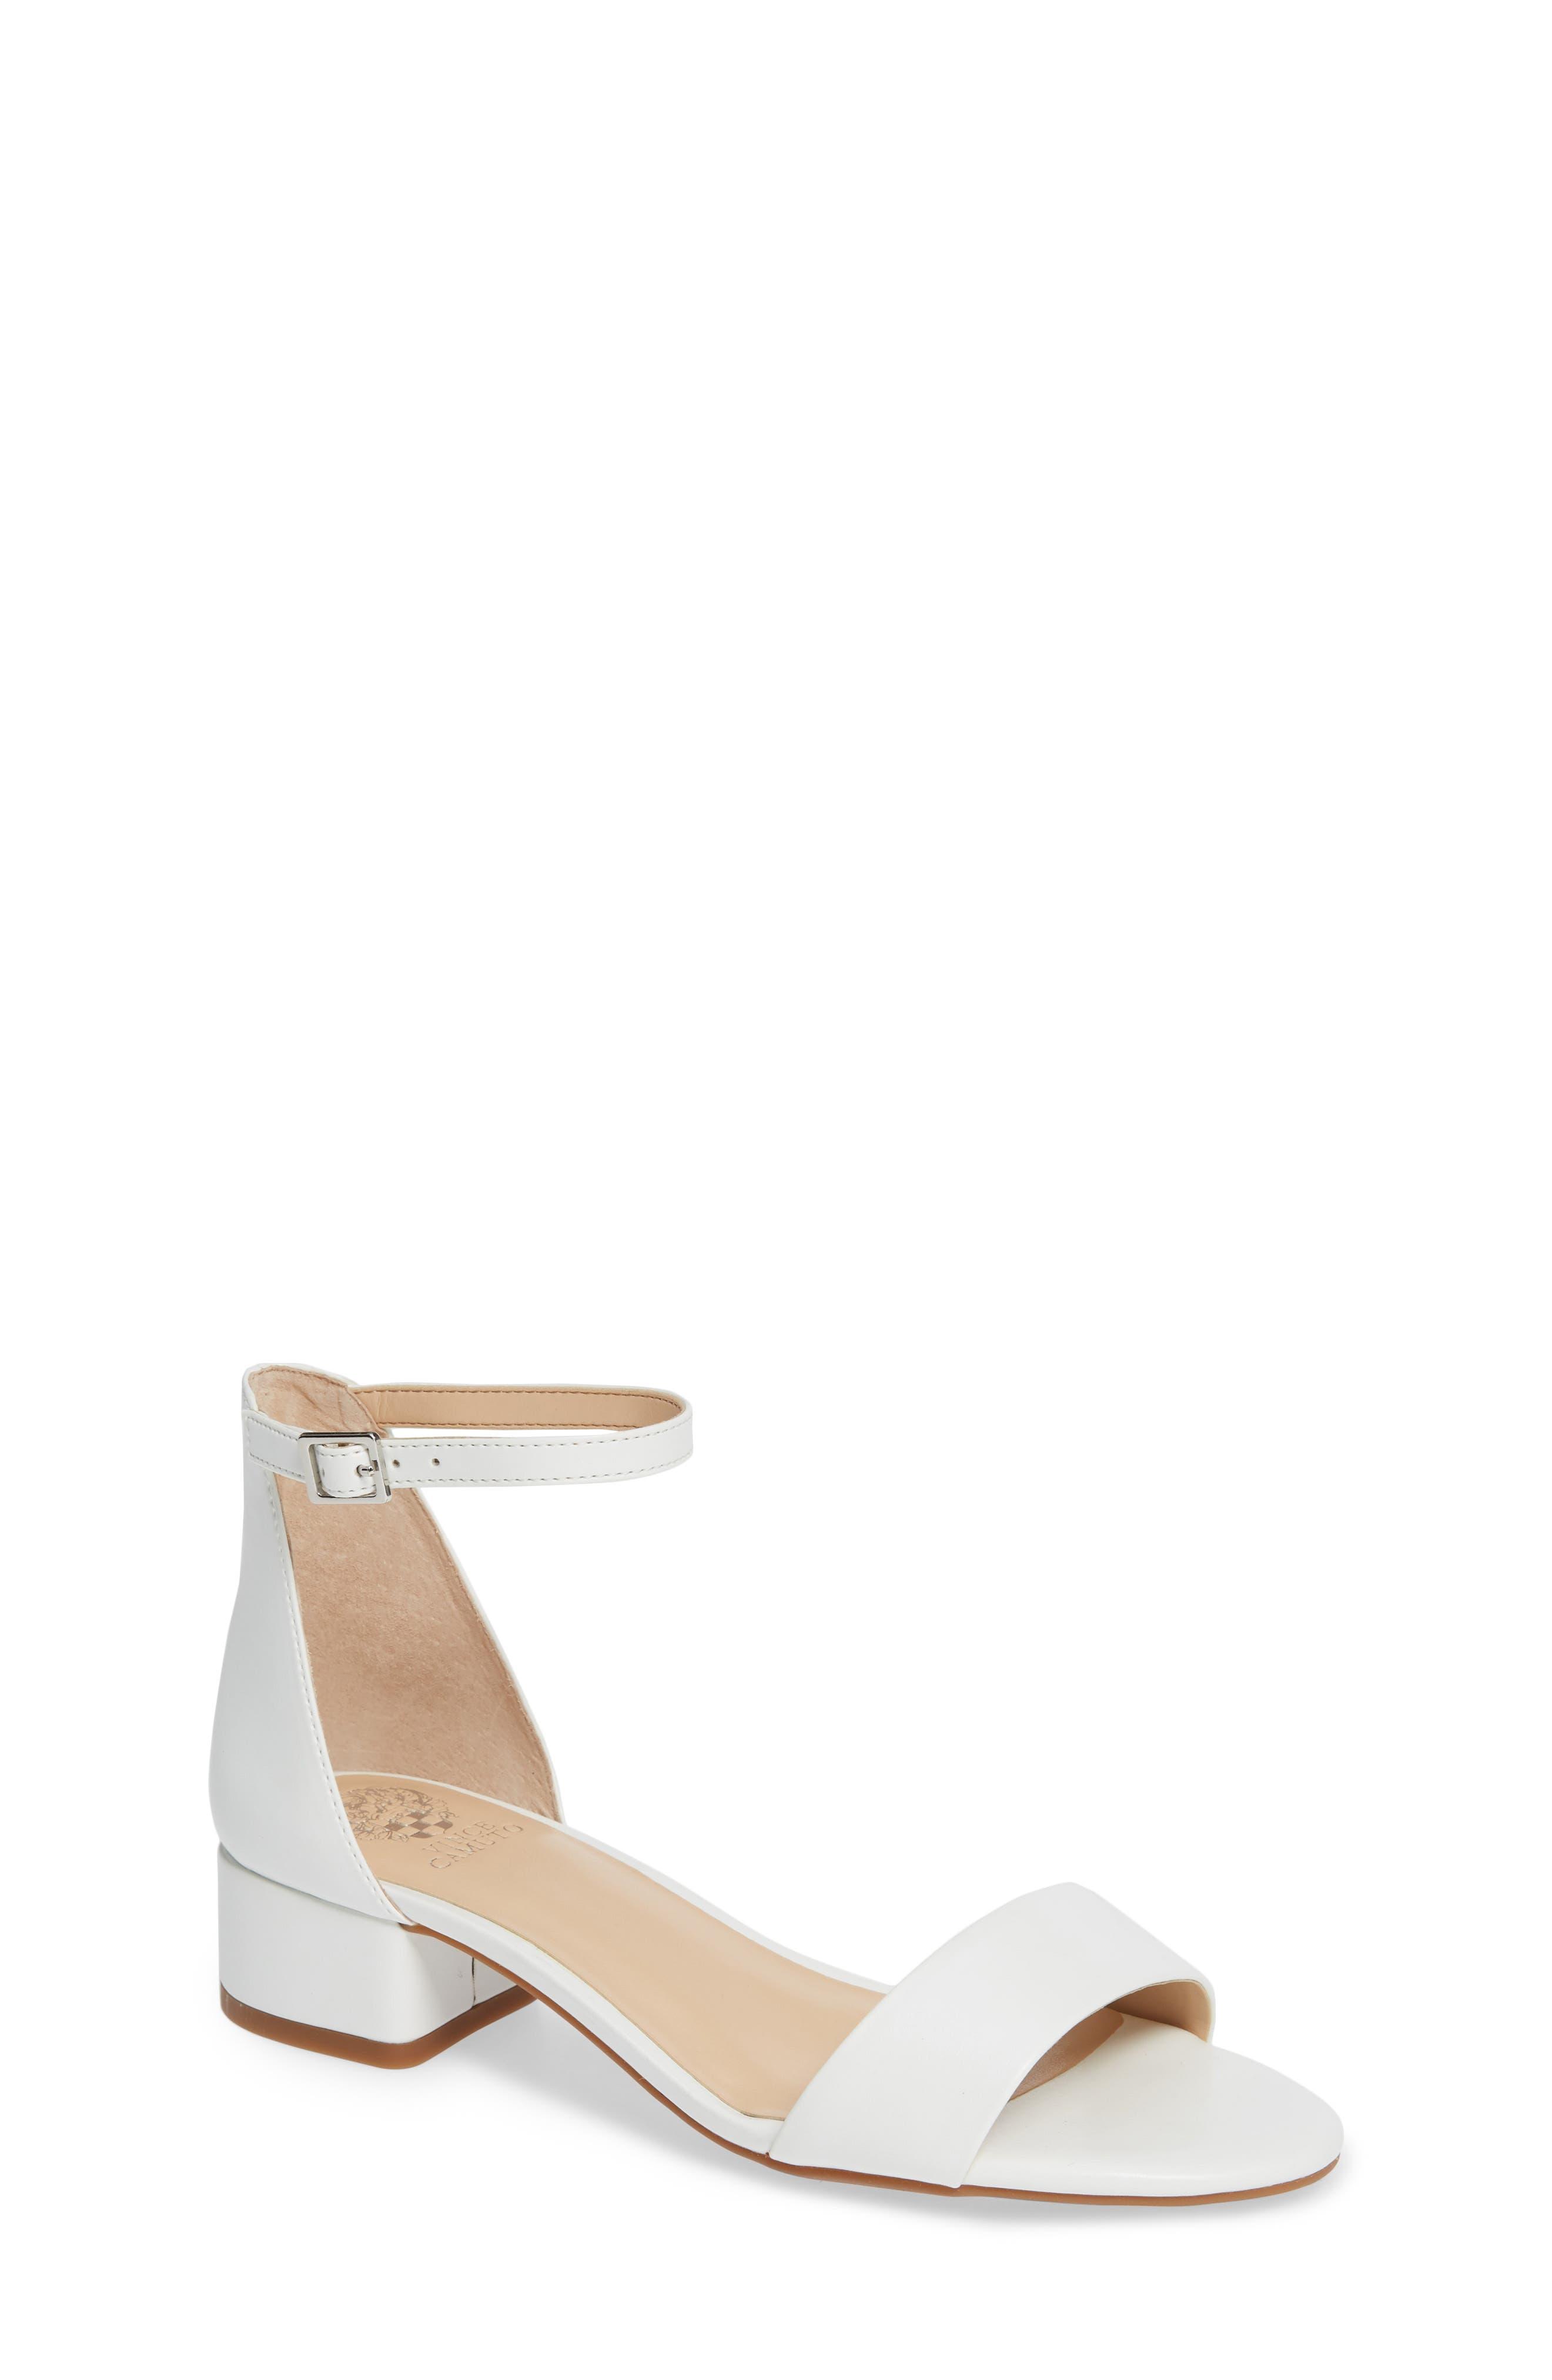 Pascala Sandal,                         Main,                         color, WHITE